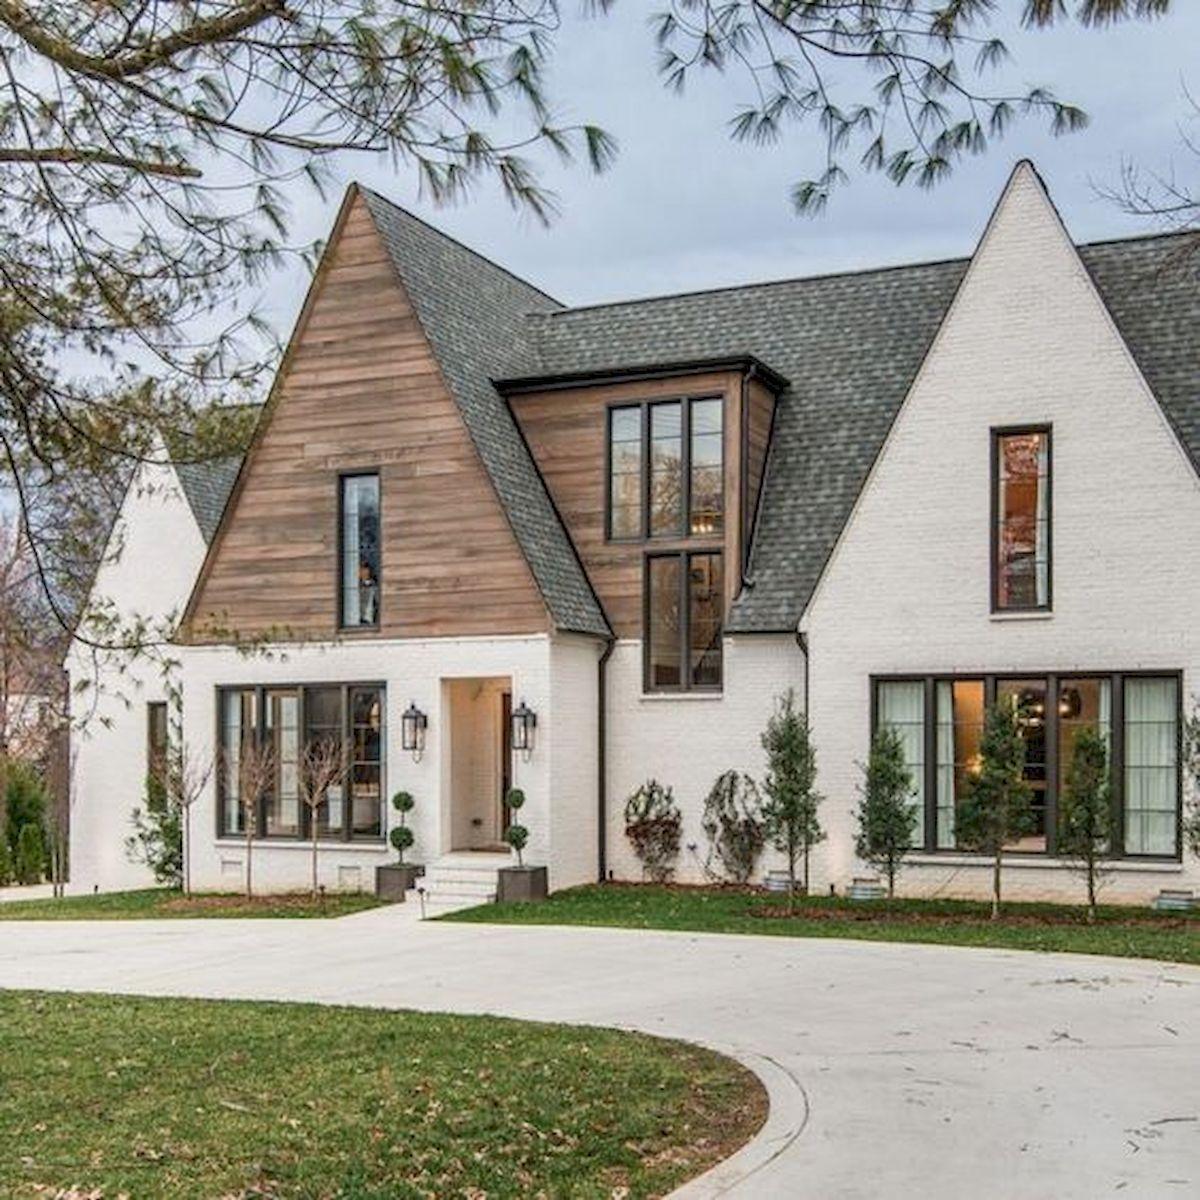 33 beautiful modern farmhouse exterior design ideas33decor on beautiful modern farmhouse trending exterior design ideas id=26196